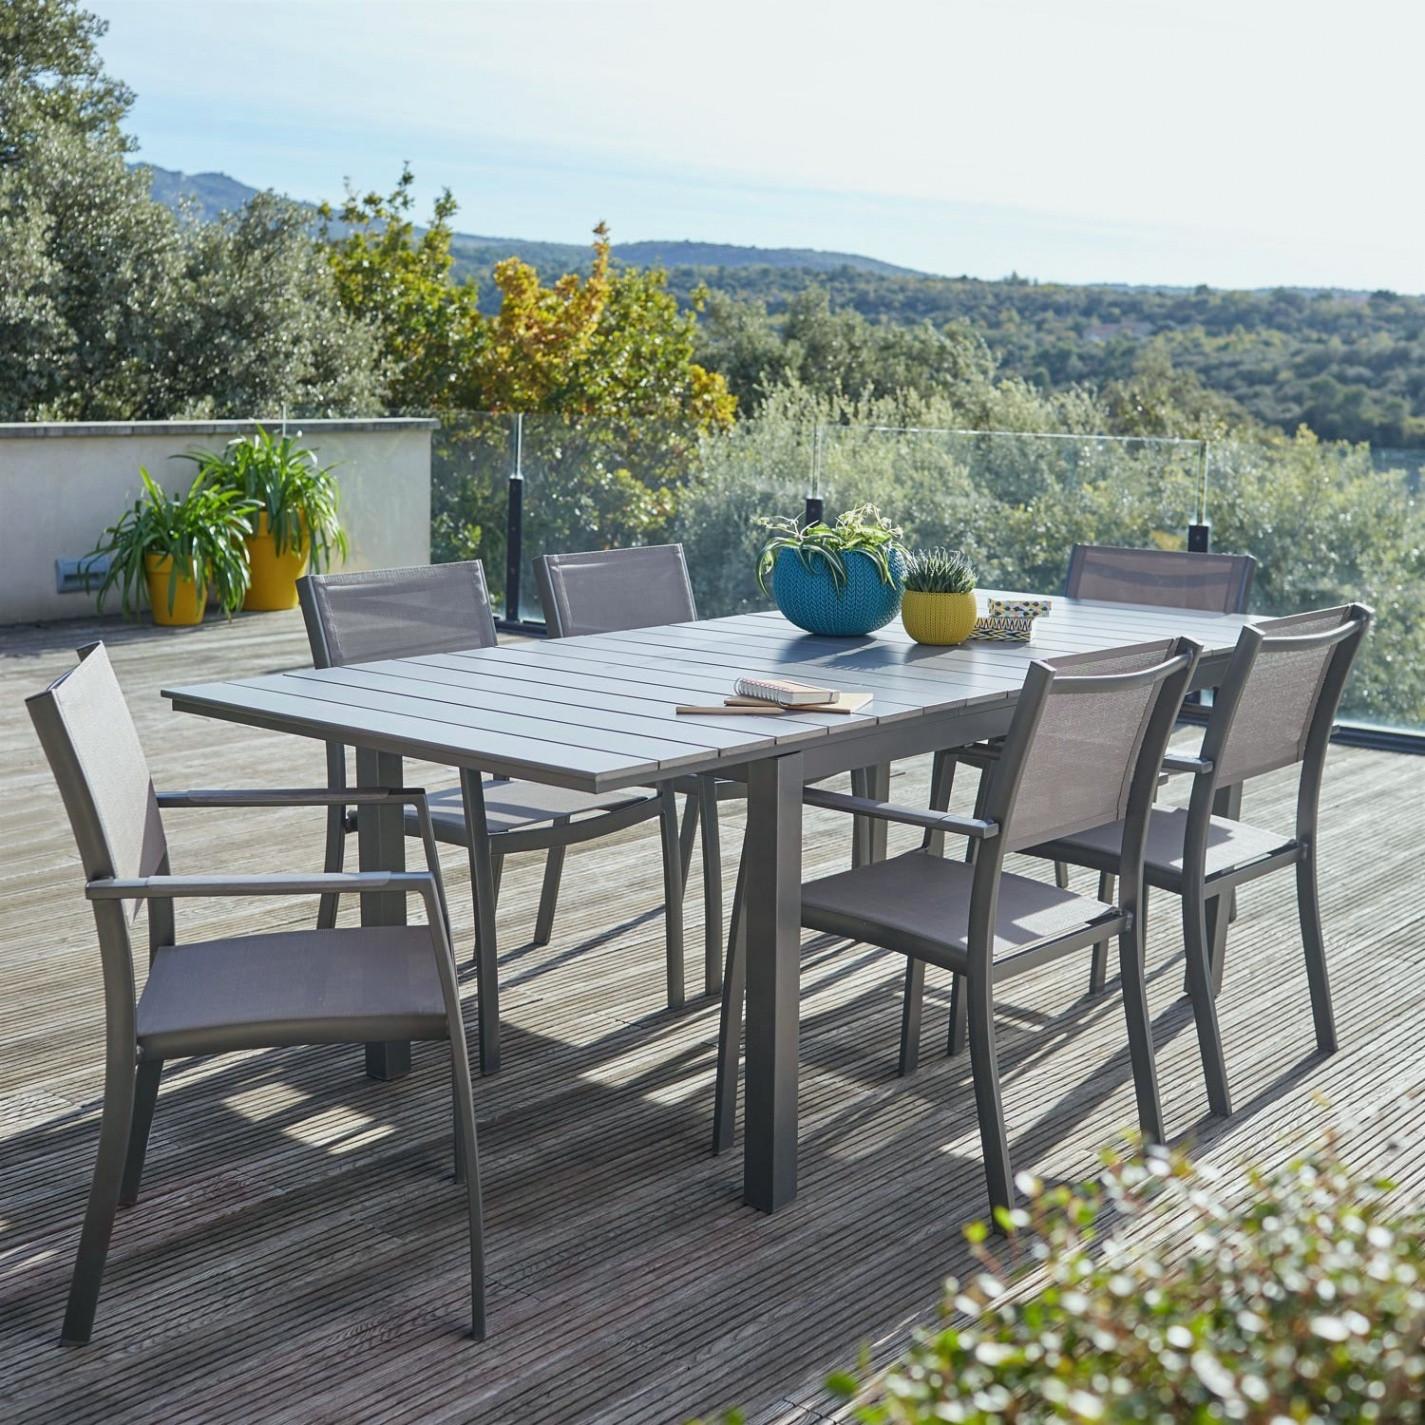 salon de jardin gris luxury table de jardin metal inspirant lantern wrought iron fenjer od table of salon de jardin gris